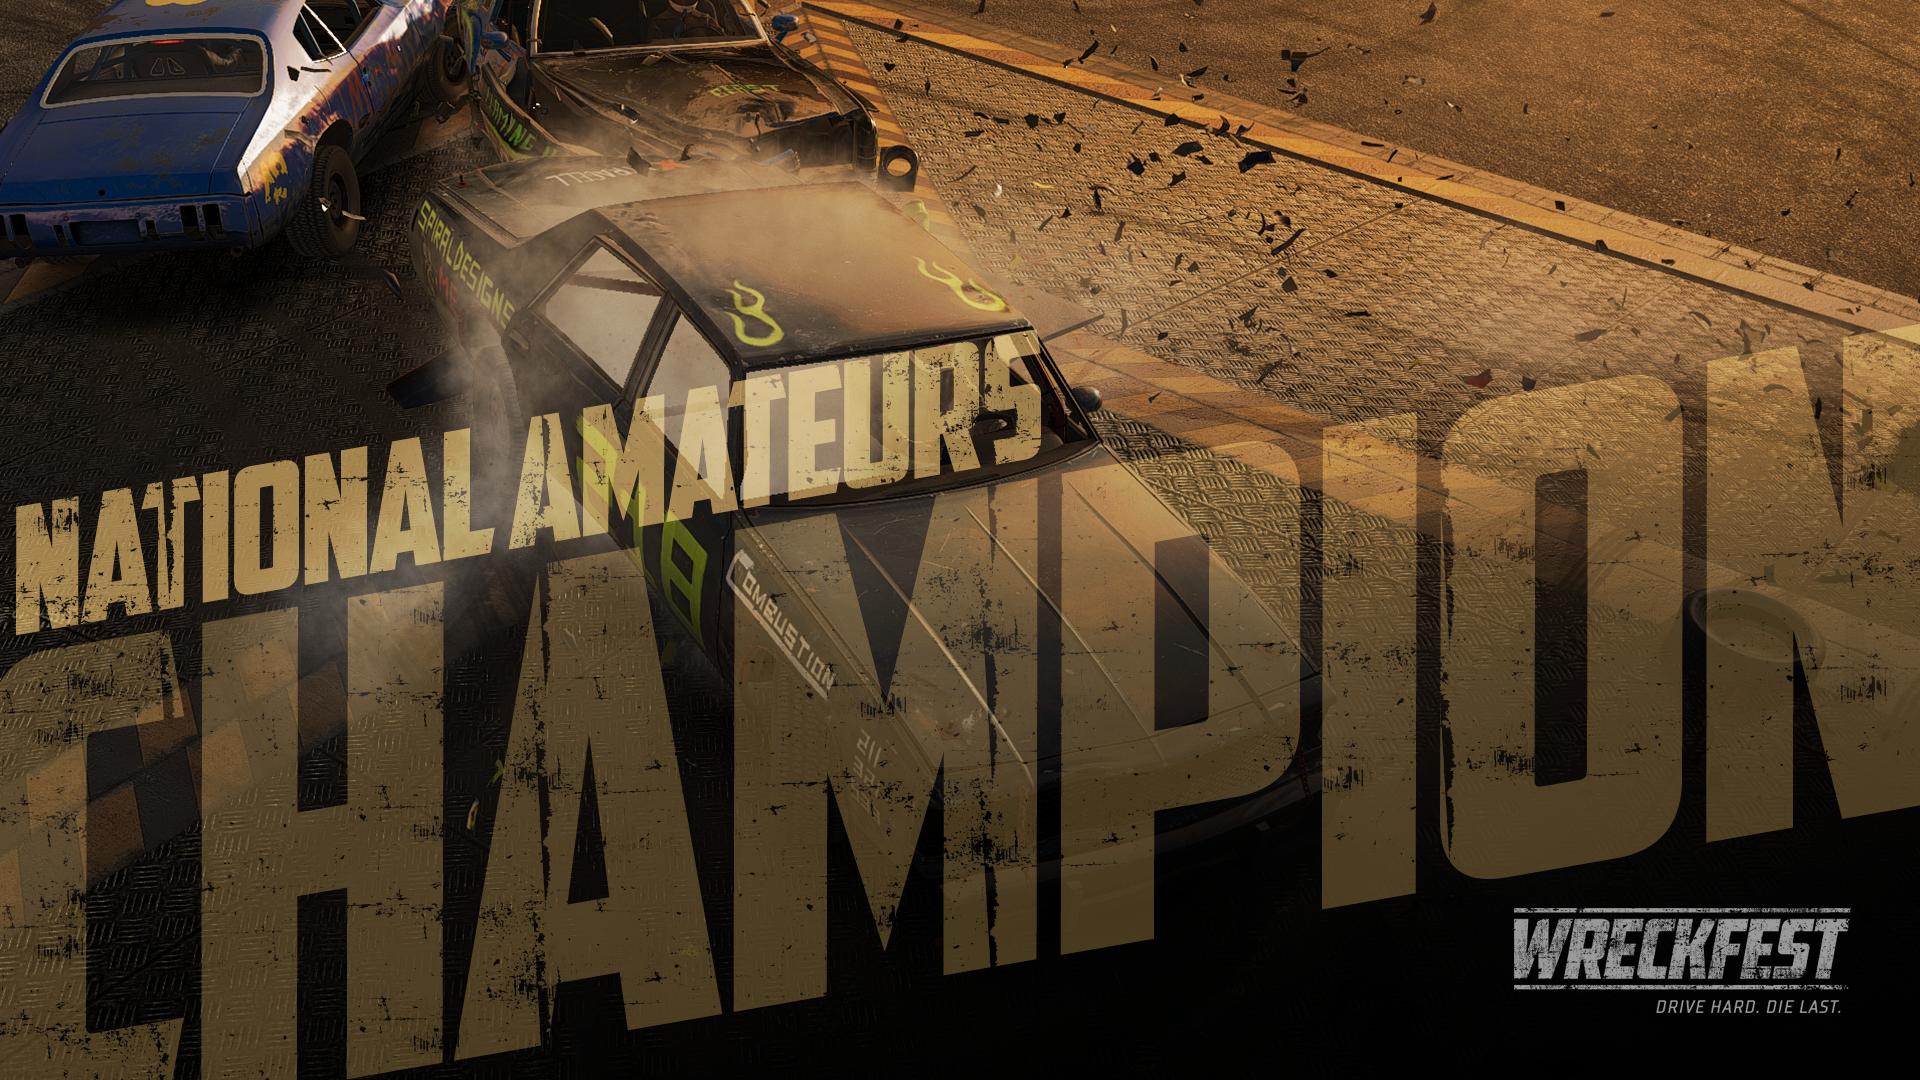 National Amateurs Champion